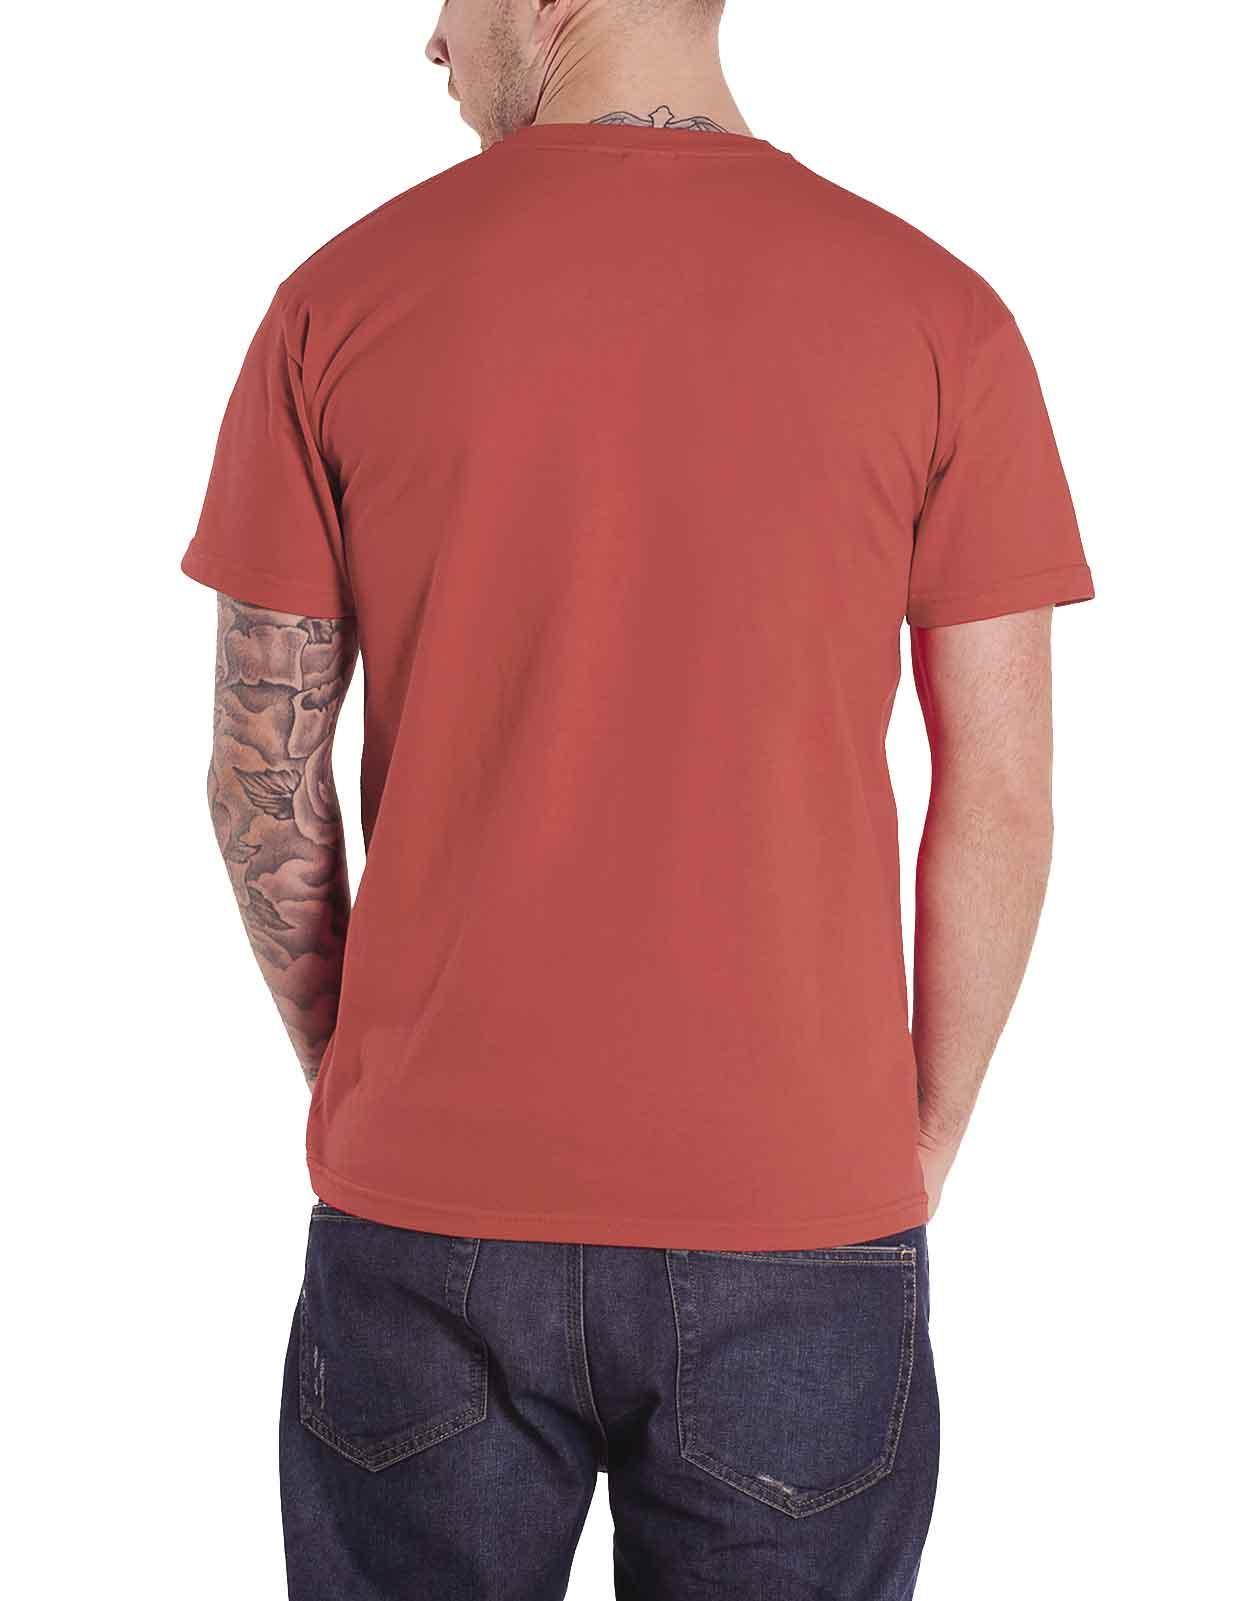 Official-Motley-Crue-T-Shirt-Shout-at-the-Devil-The-Dirt-Tour-Band-Logo-Mens thumbnail 40